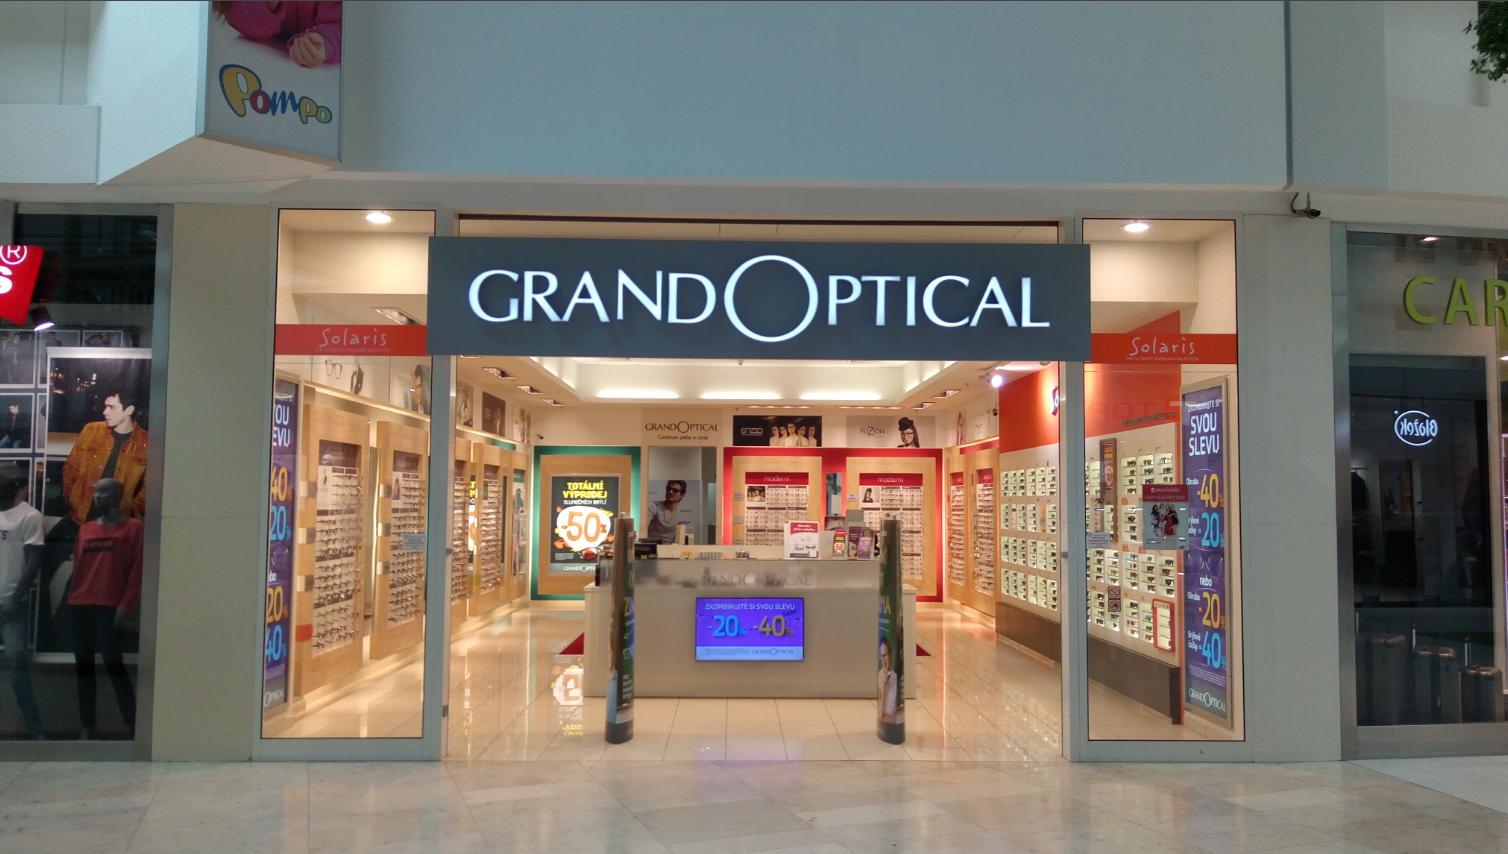 GrandOptical - oční optika Metropole Zličín